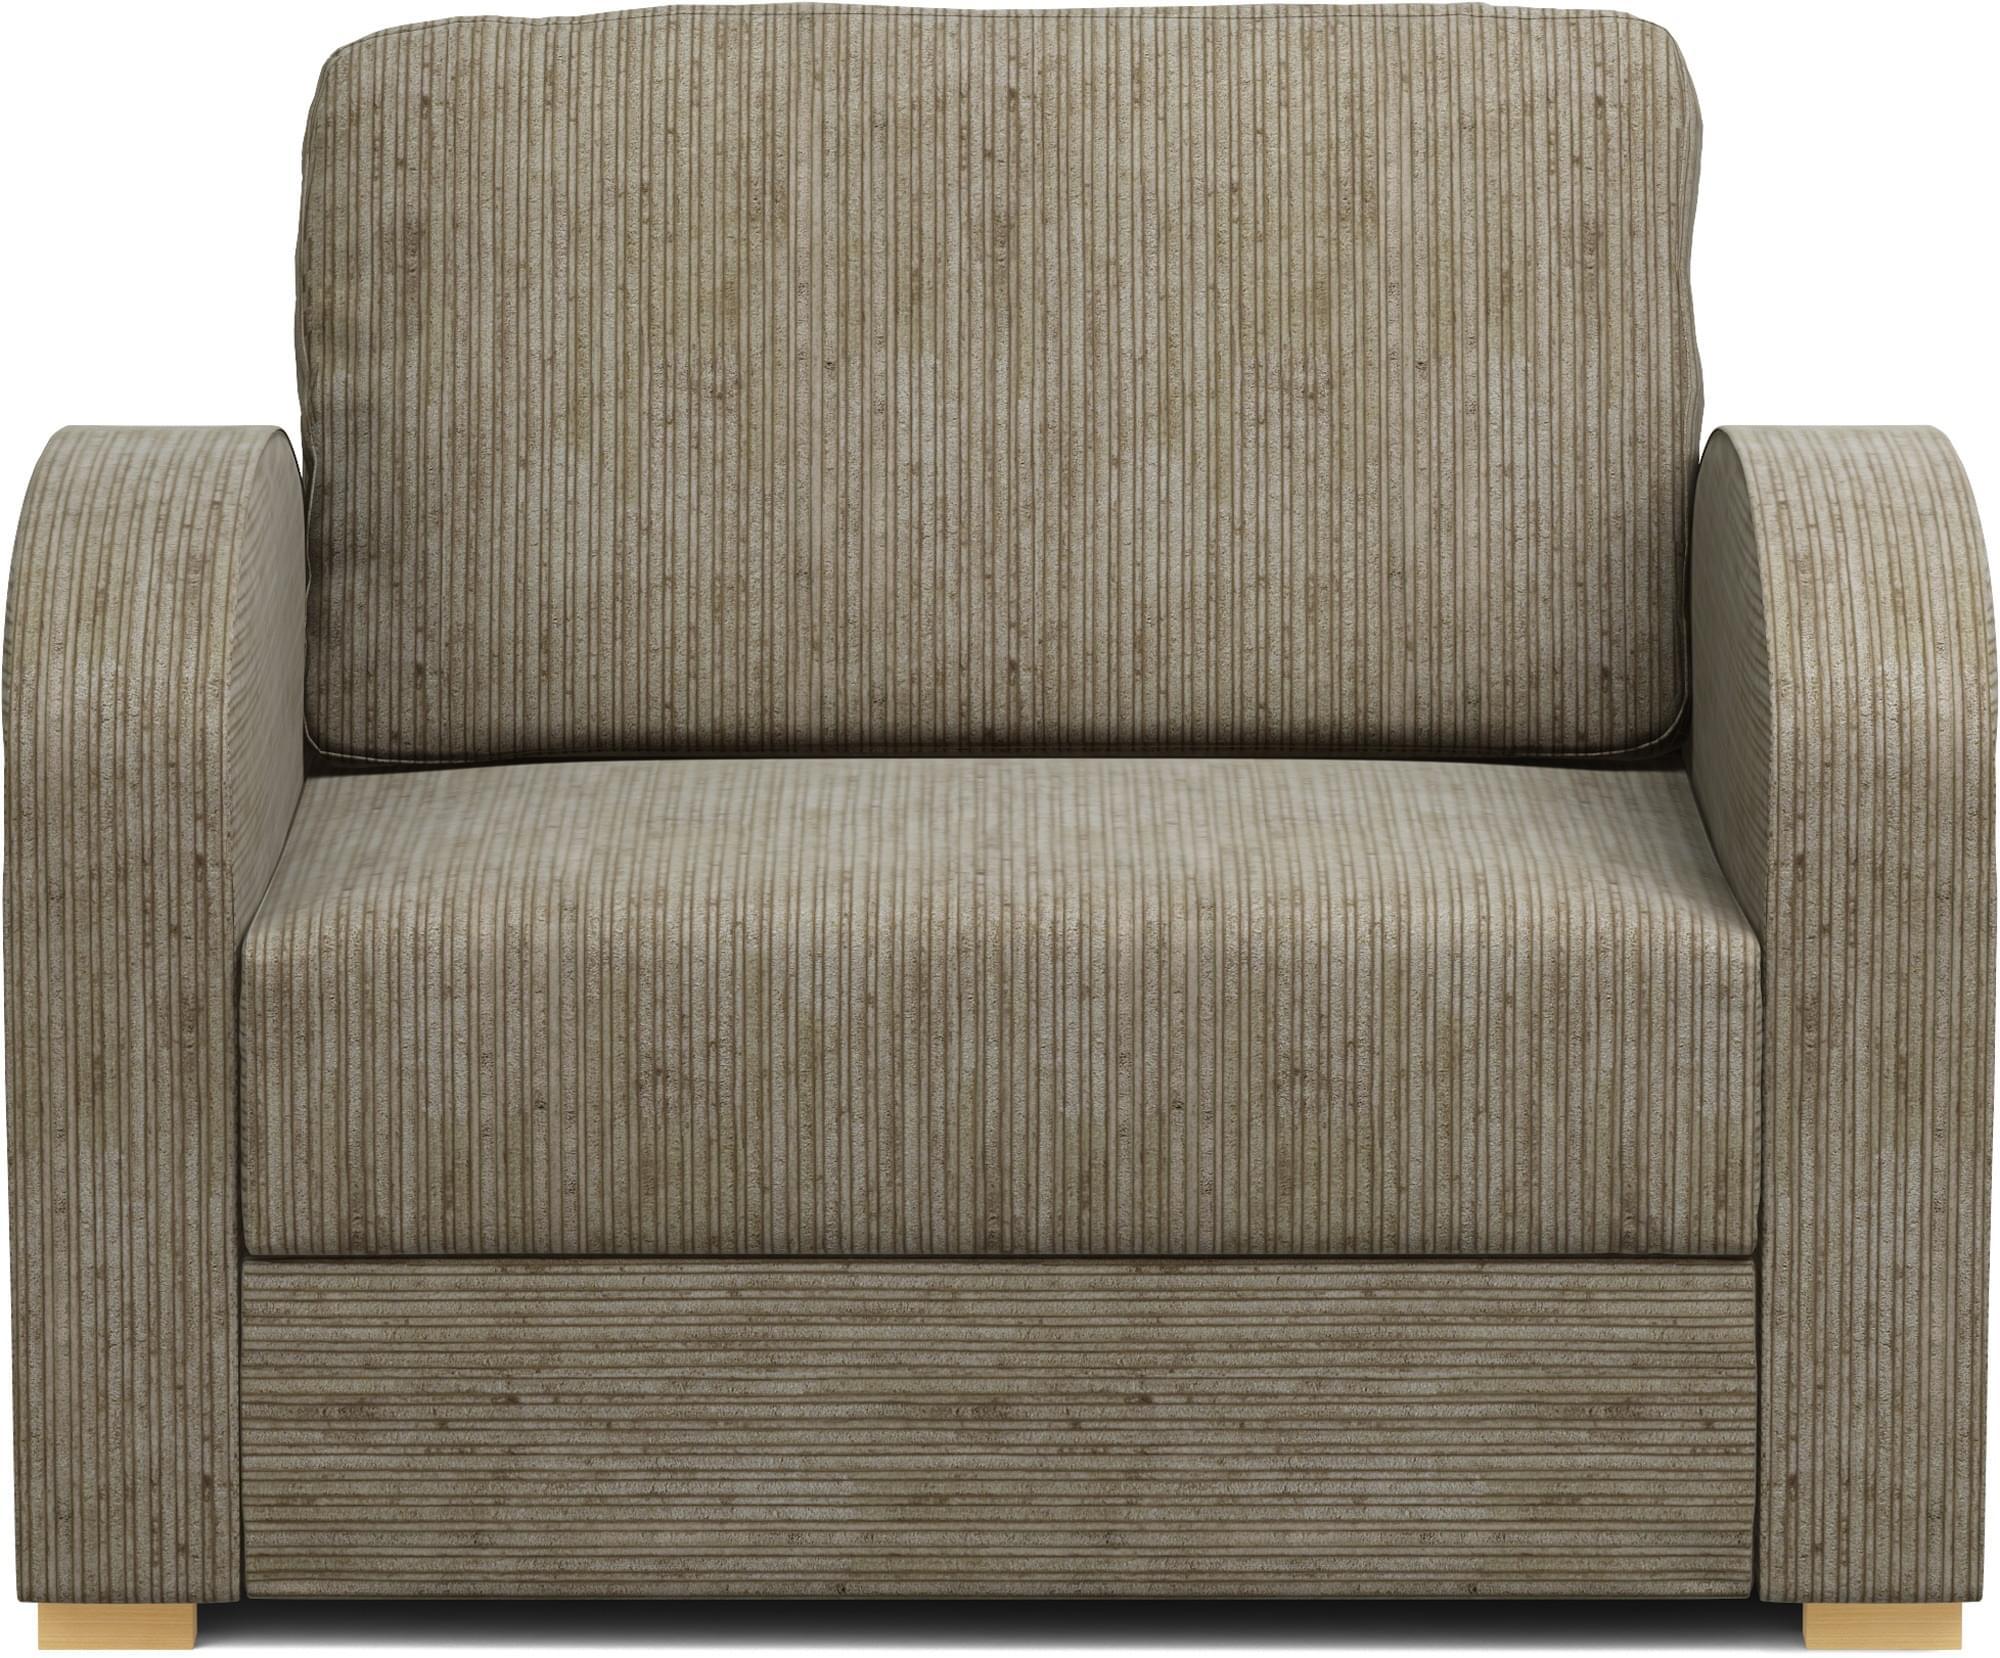 Arc Armchair Sofa Bed - Big Armchair Bed | Nabru